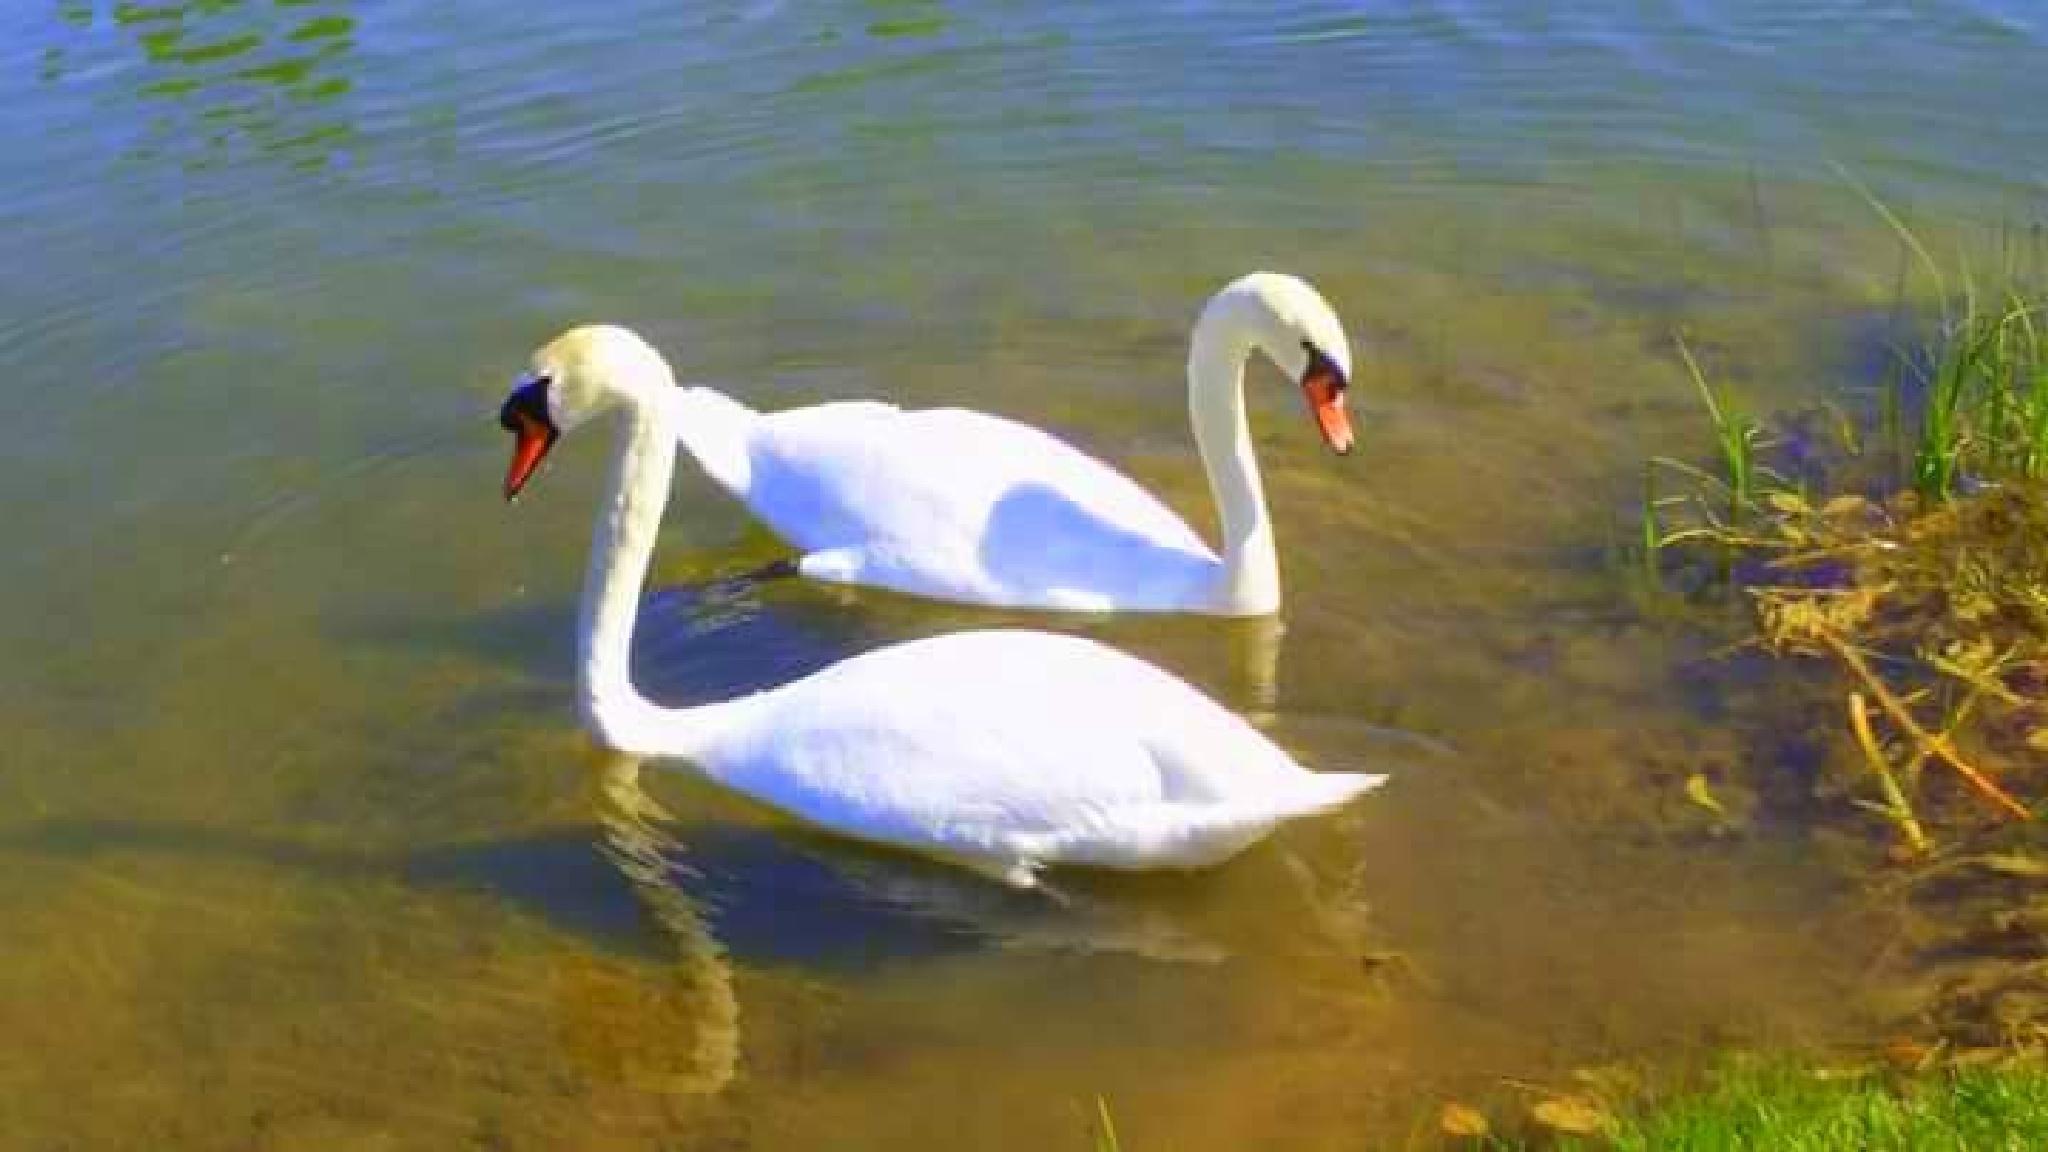 Two swans by uzkuraitiene62